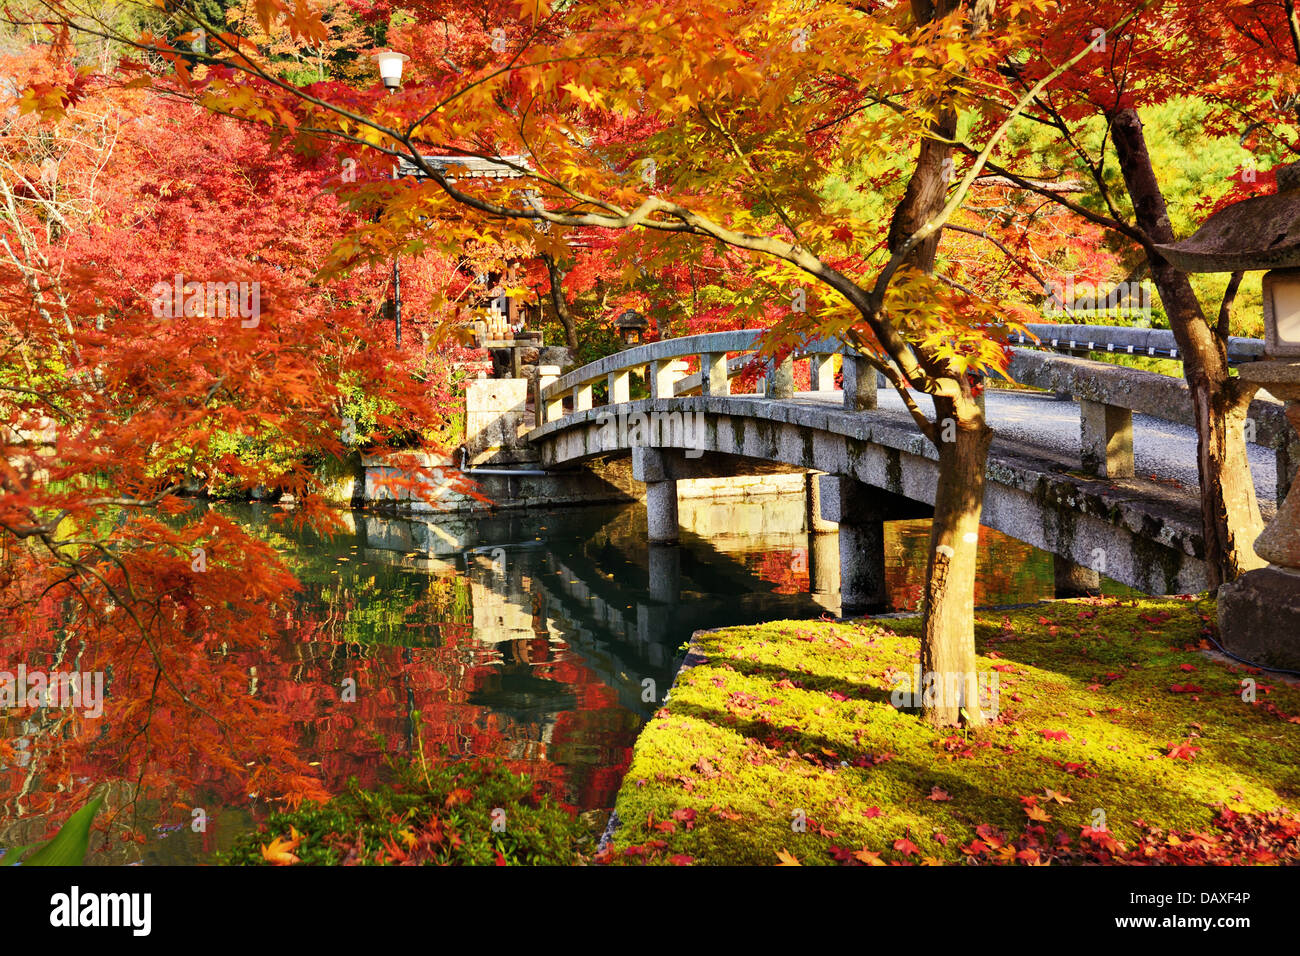 Fall foliage at Eikando Temple in Kyoto, Japan. - Stock Image